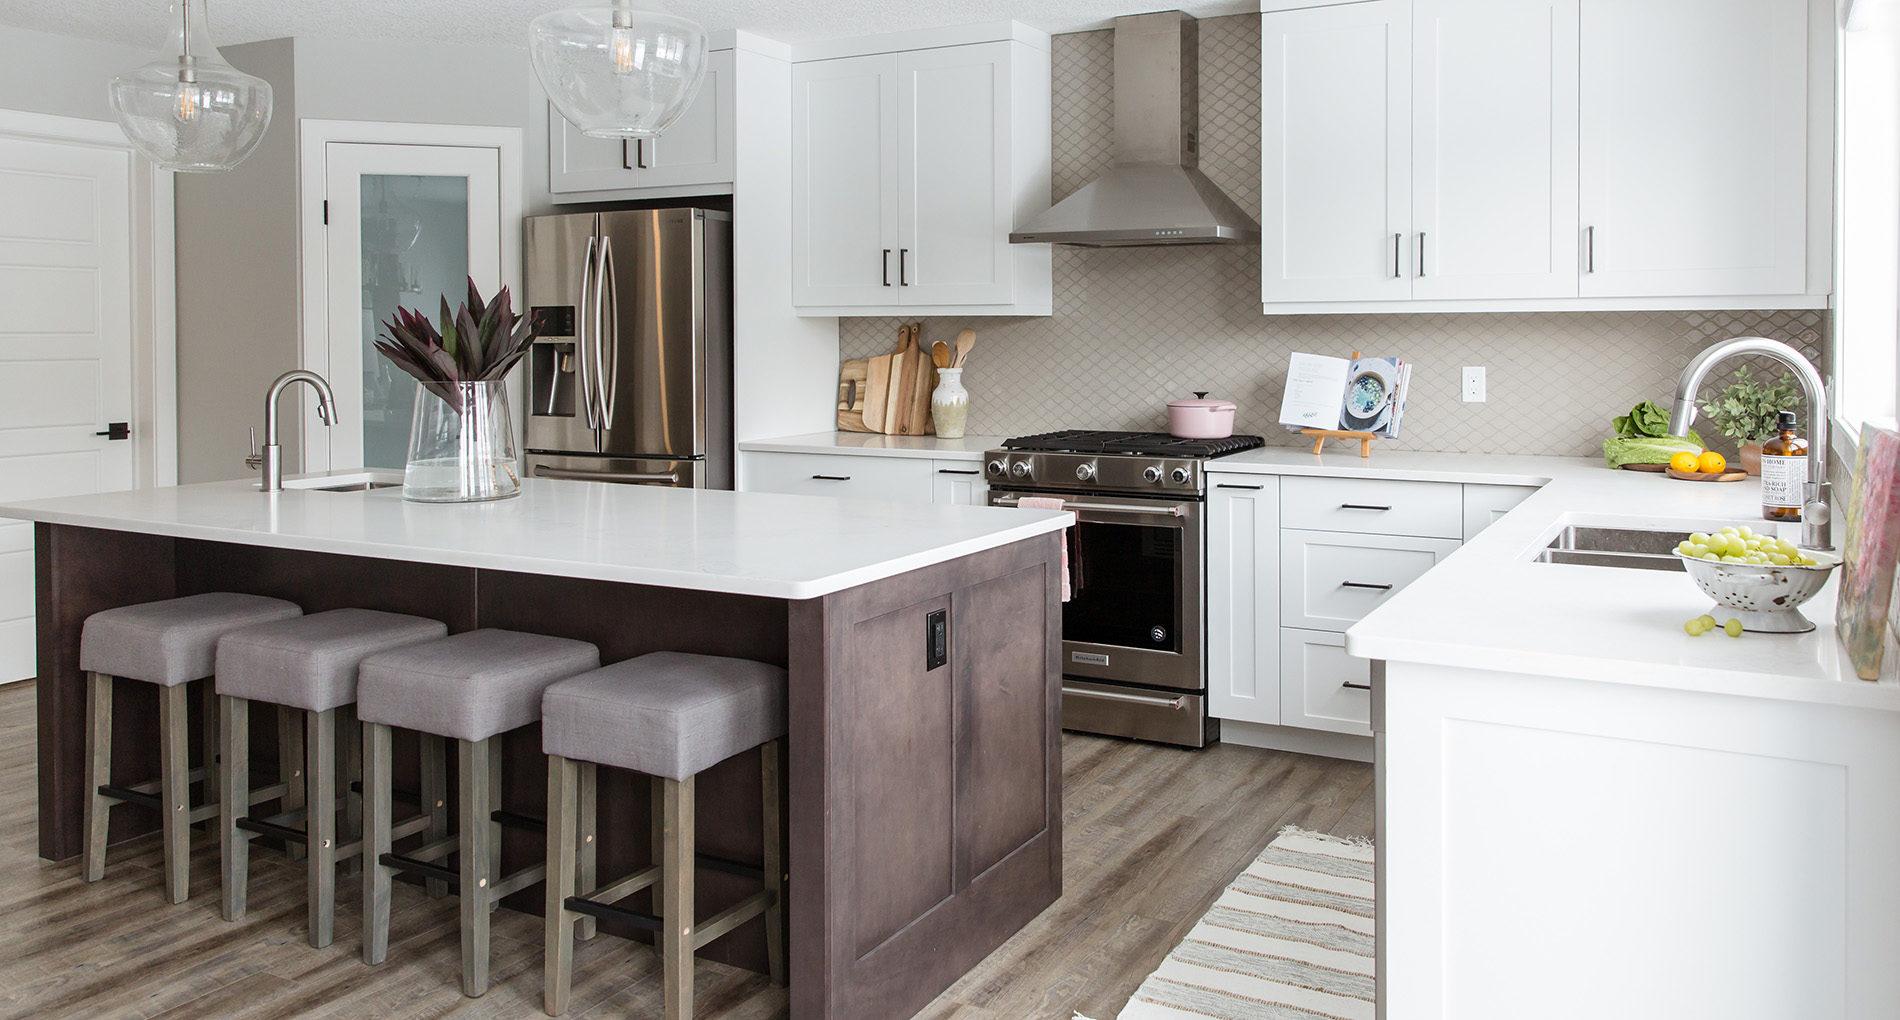 Incredible Kitchen Renovations Design In Edmonton Alair Homes Edmonton Download Free Architecture Designs Embacsunscenecom